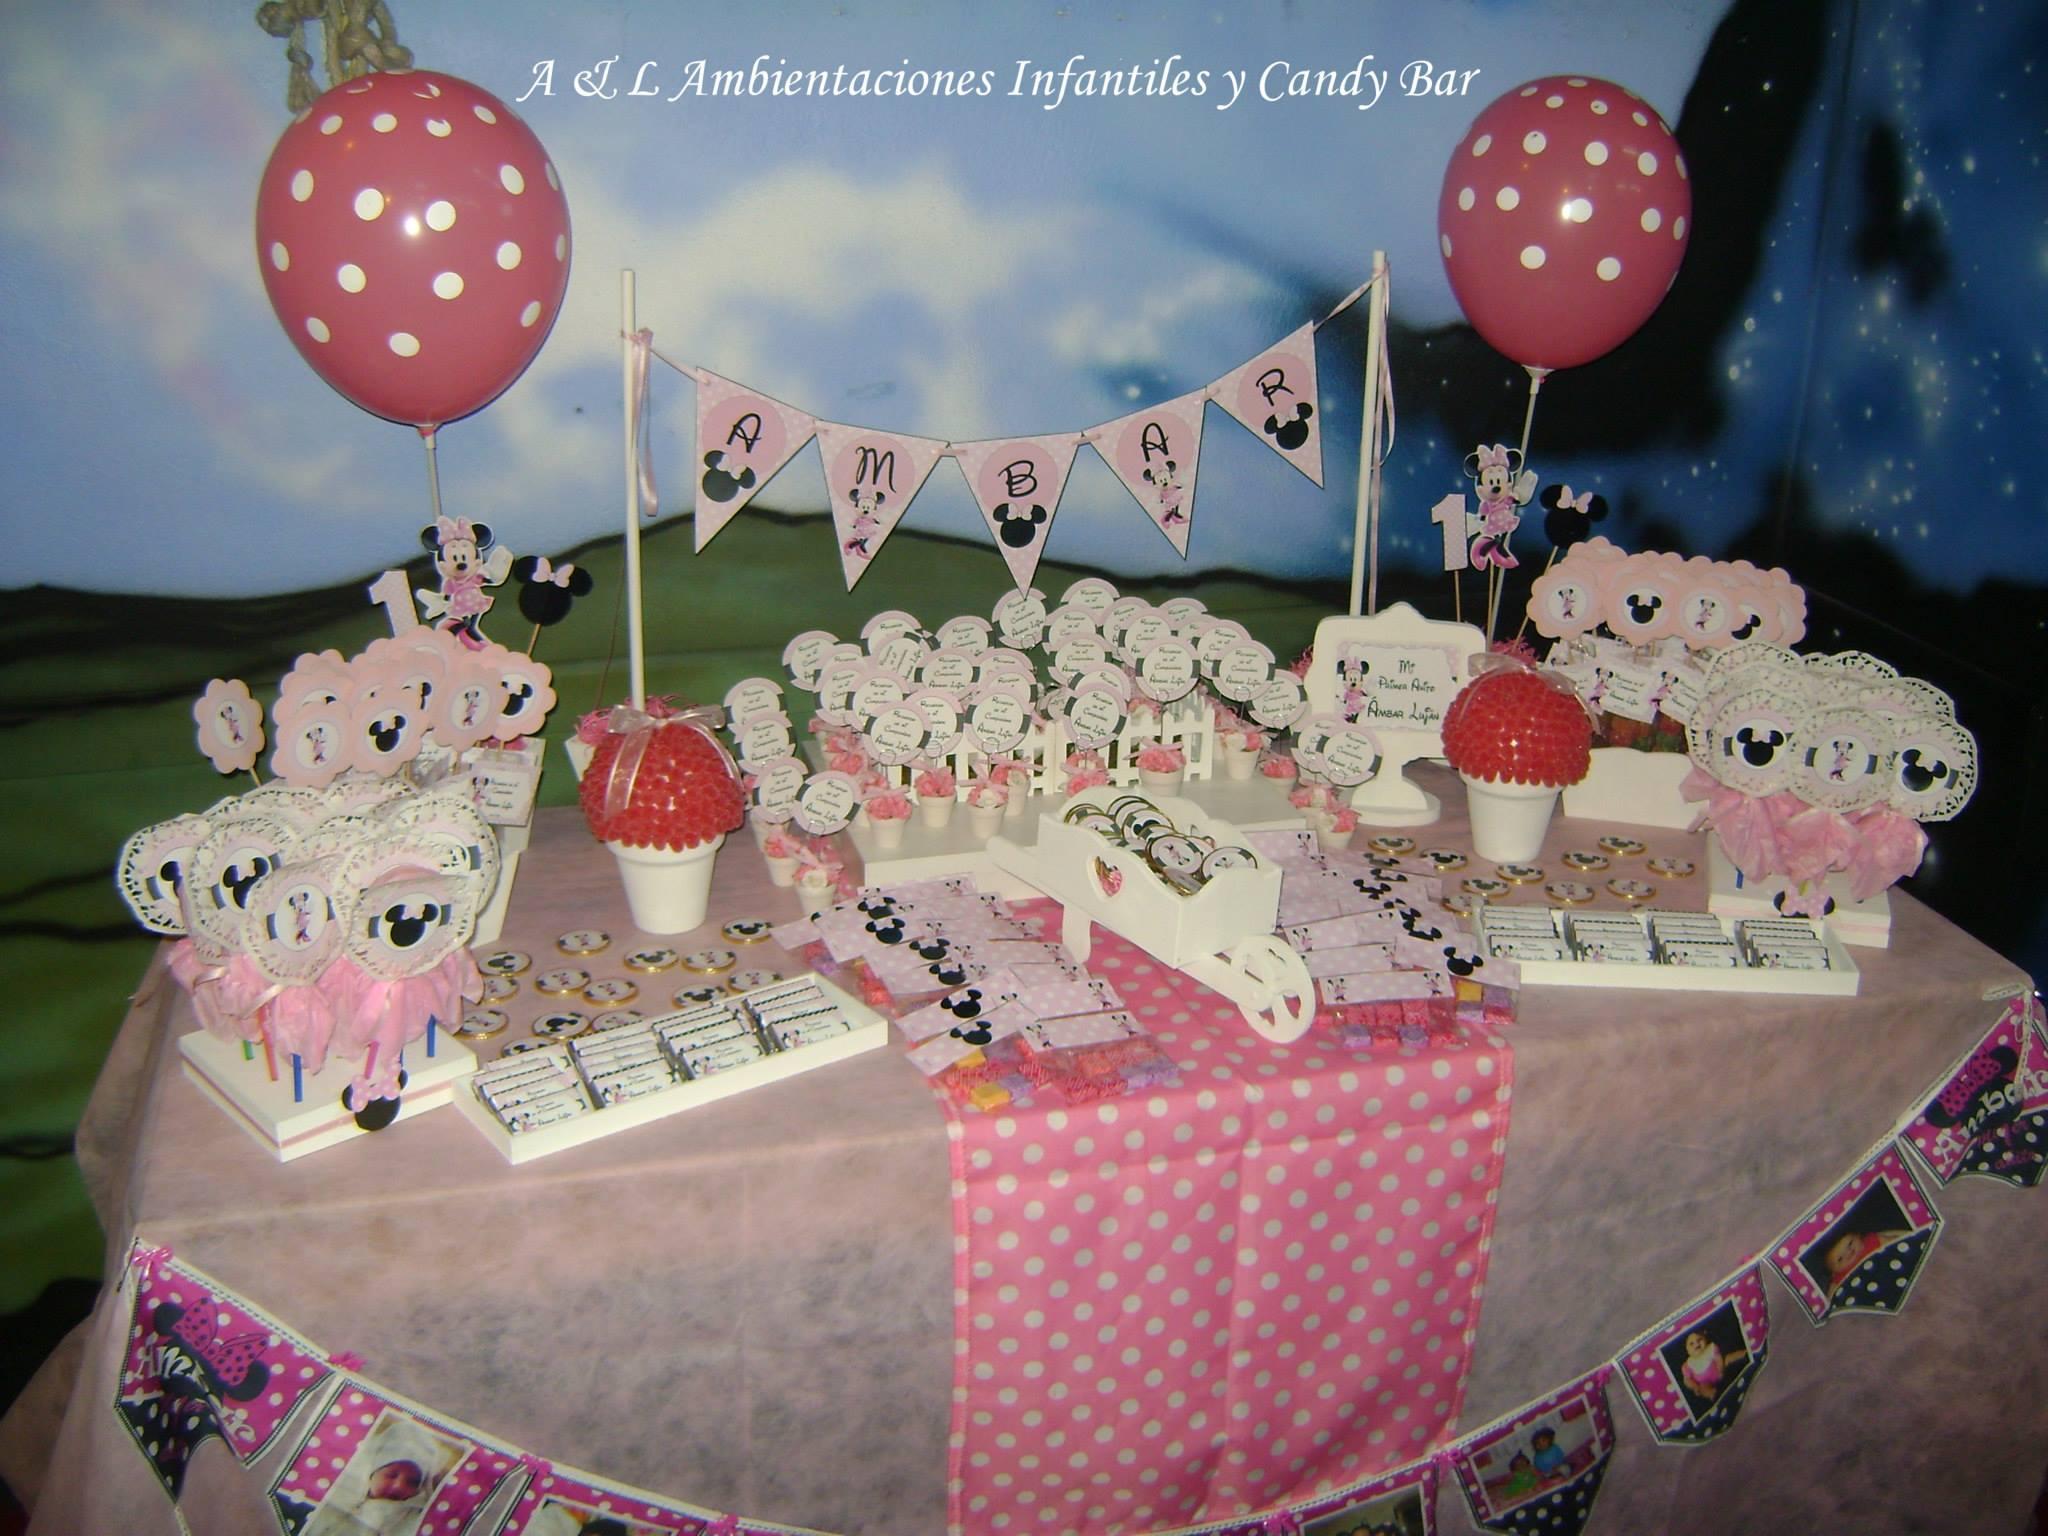 Polka dot minnie mouse party birthday party ideas themes for Polka dot party ideas